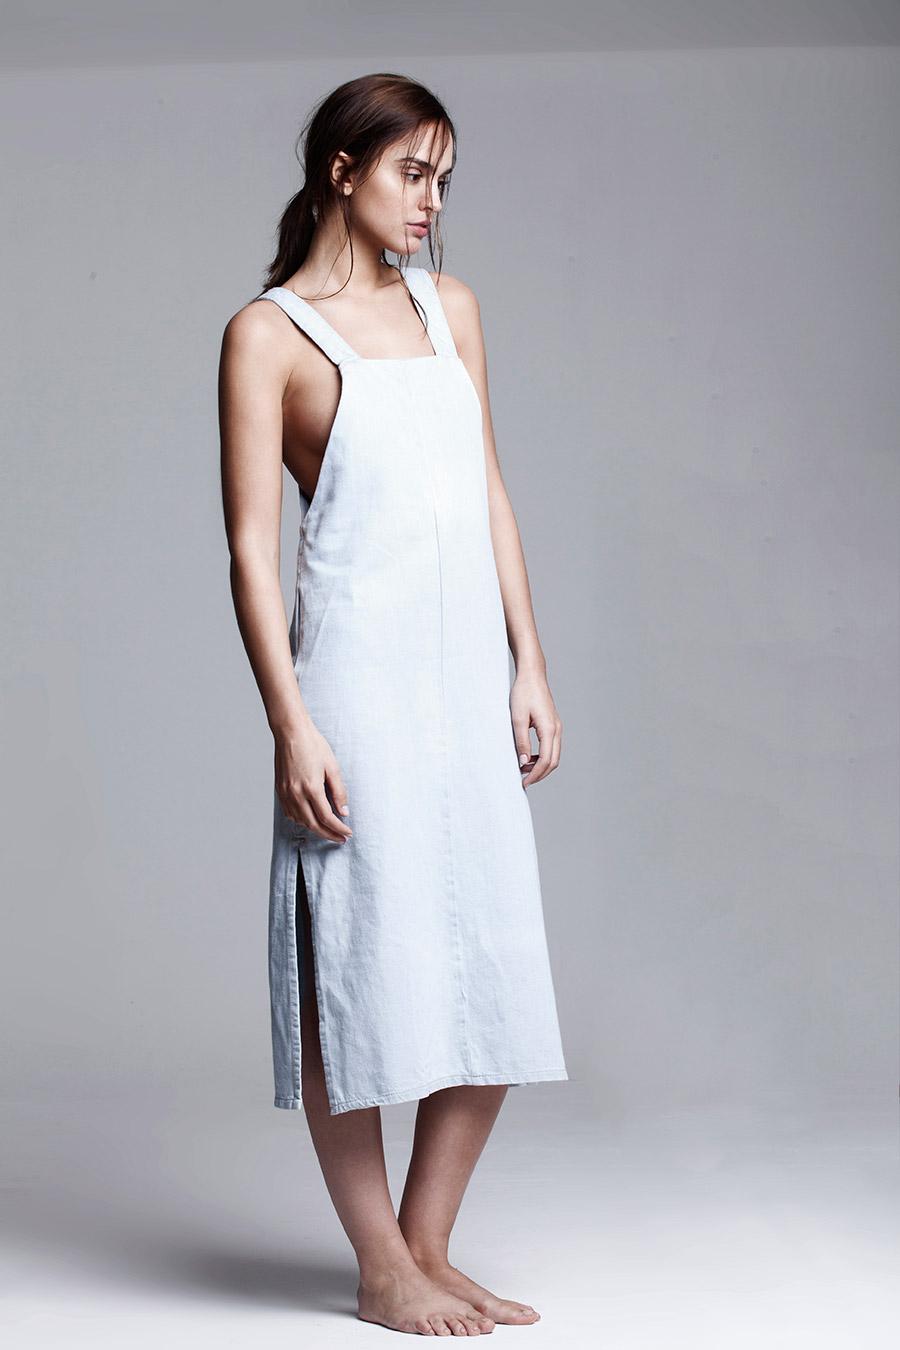 fashion-editorial-julio-paniagua-04